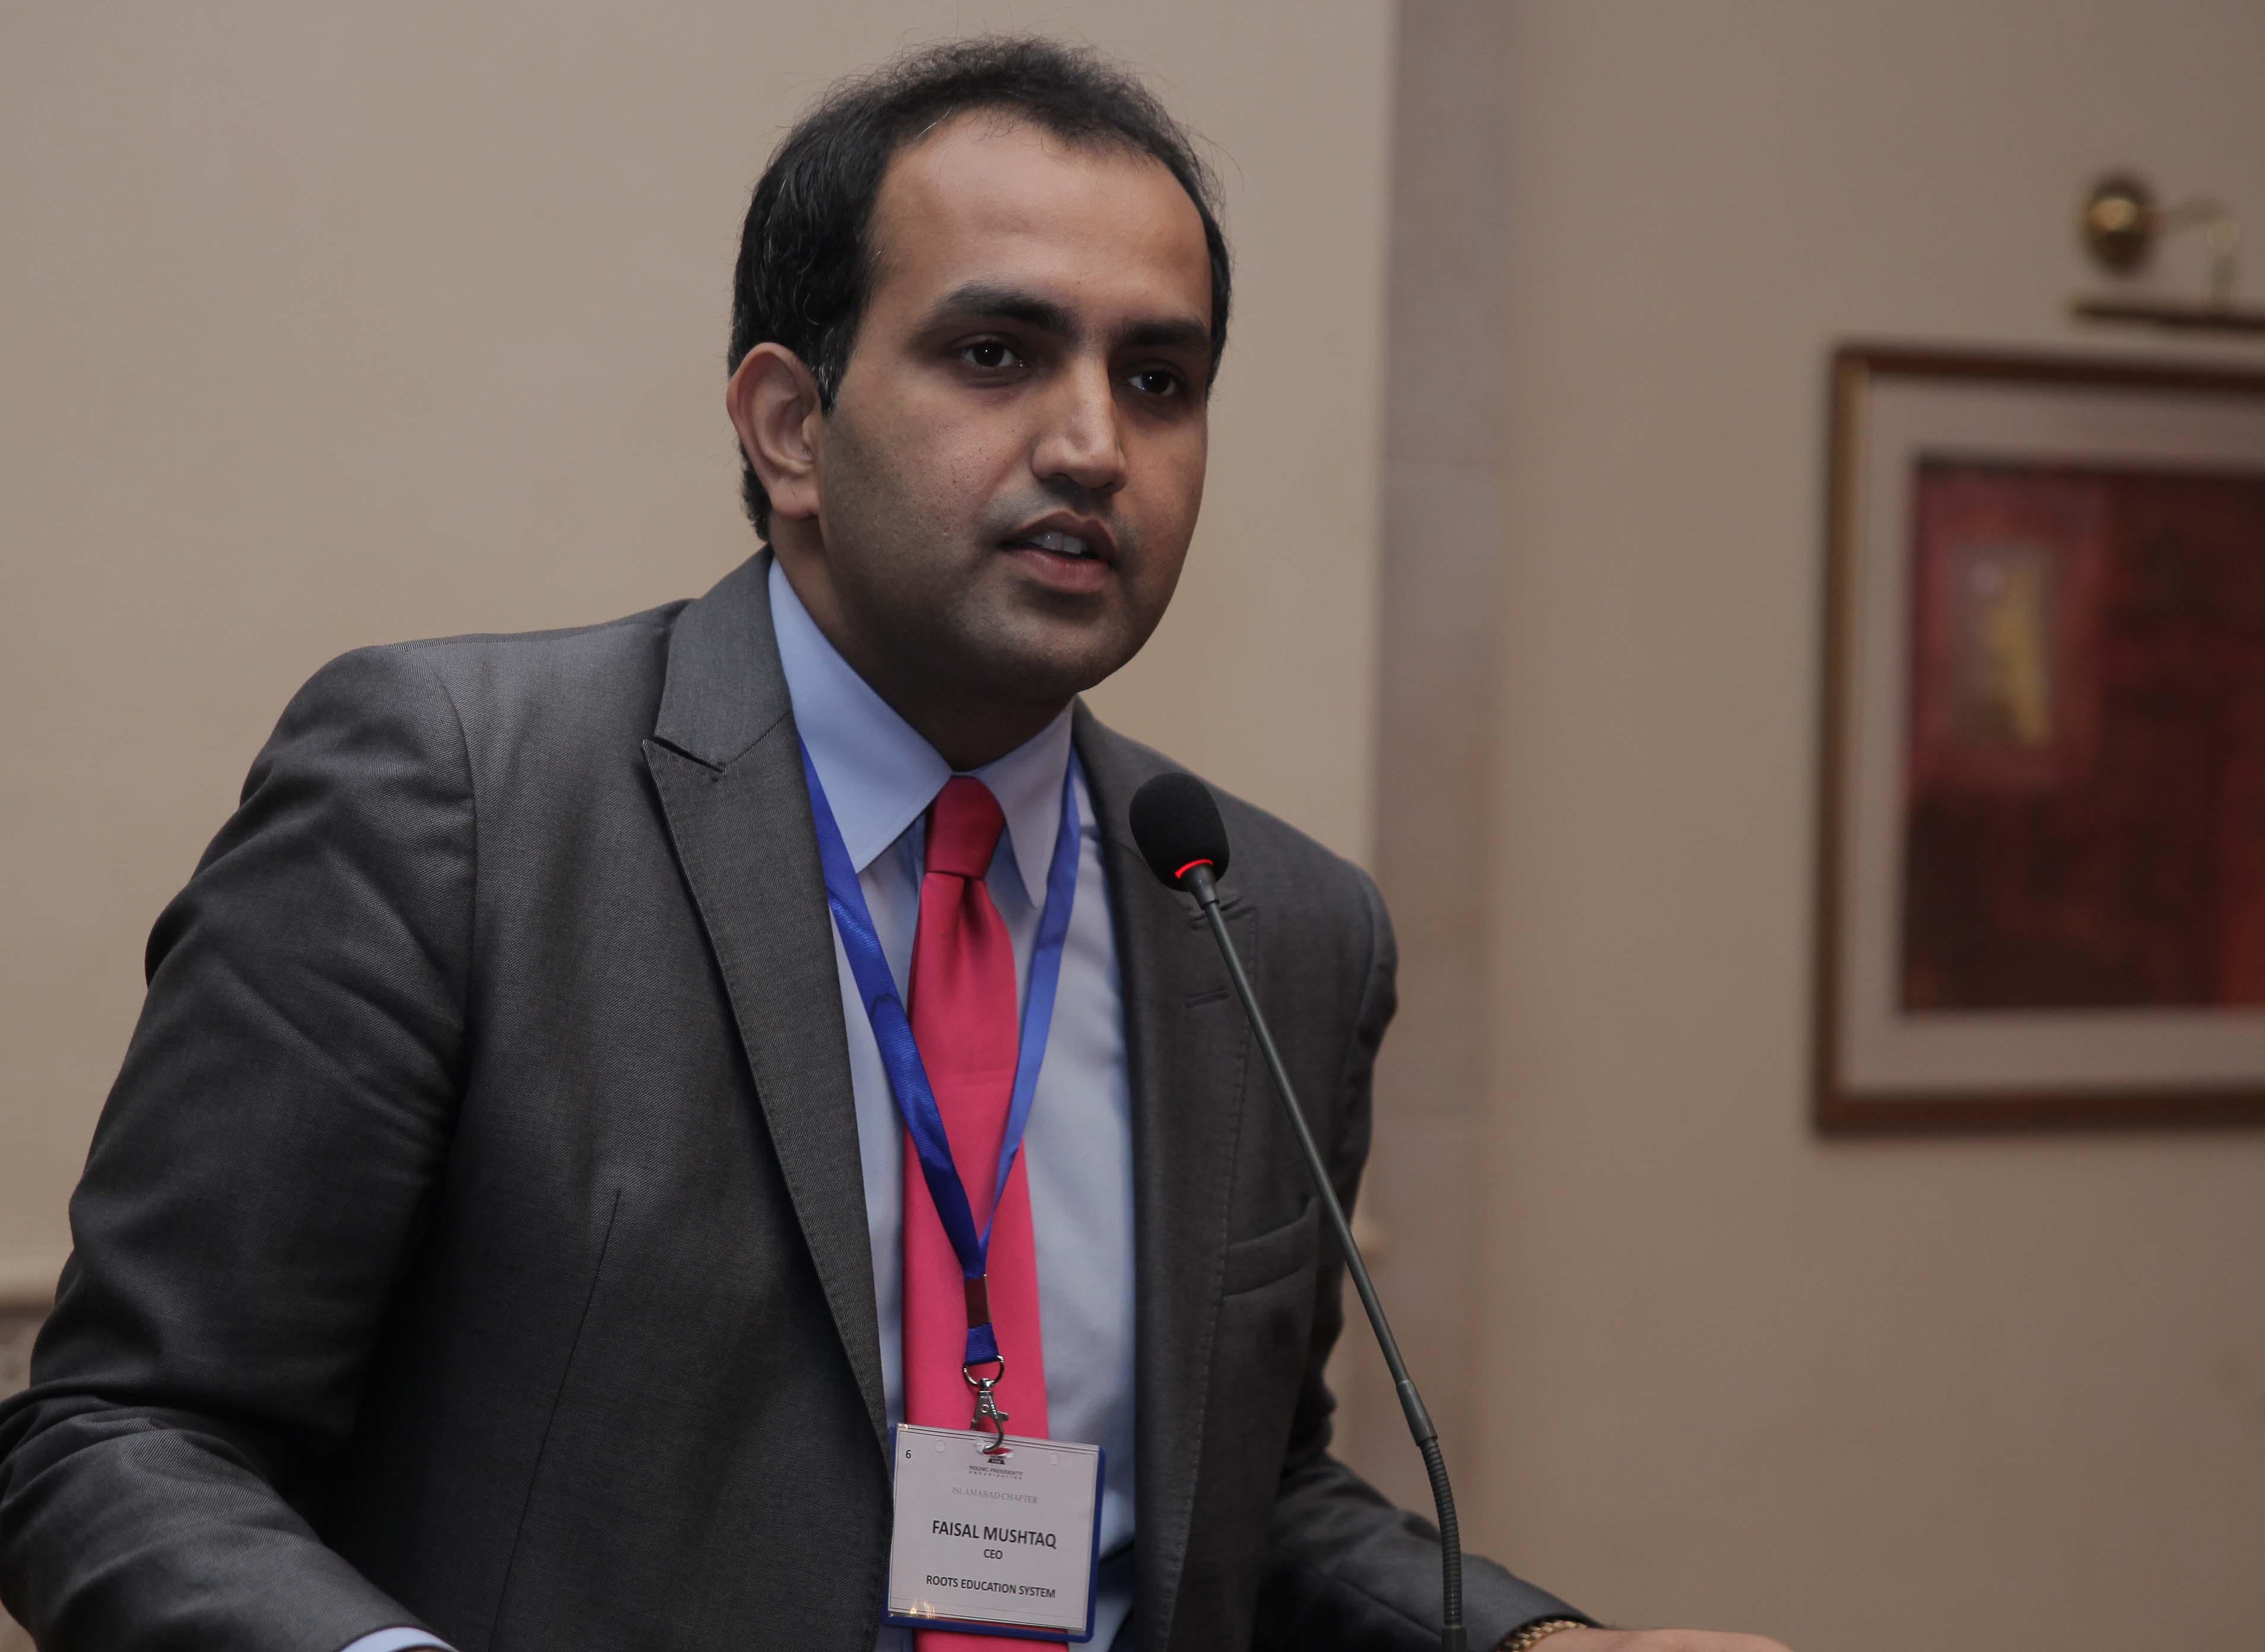 Faisal Mushtaq - Wikipedia